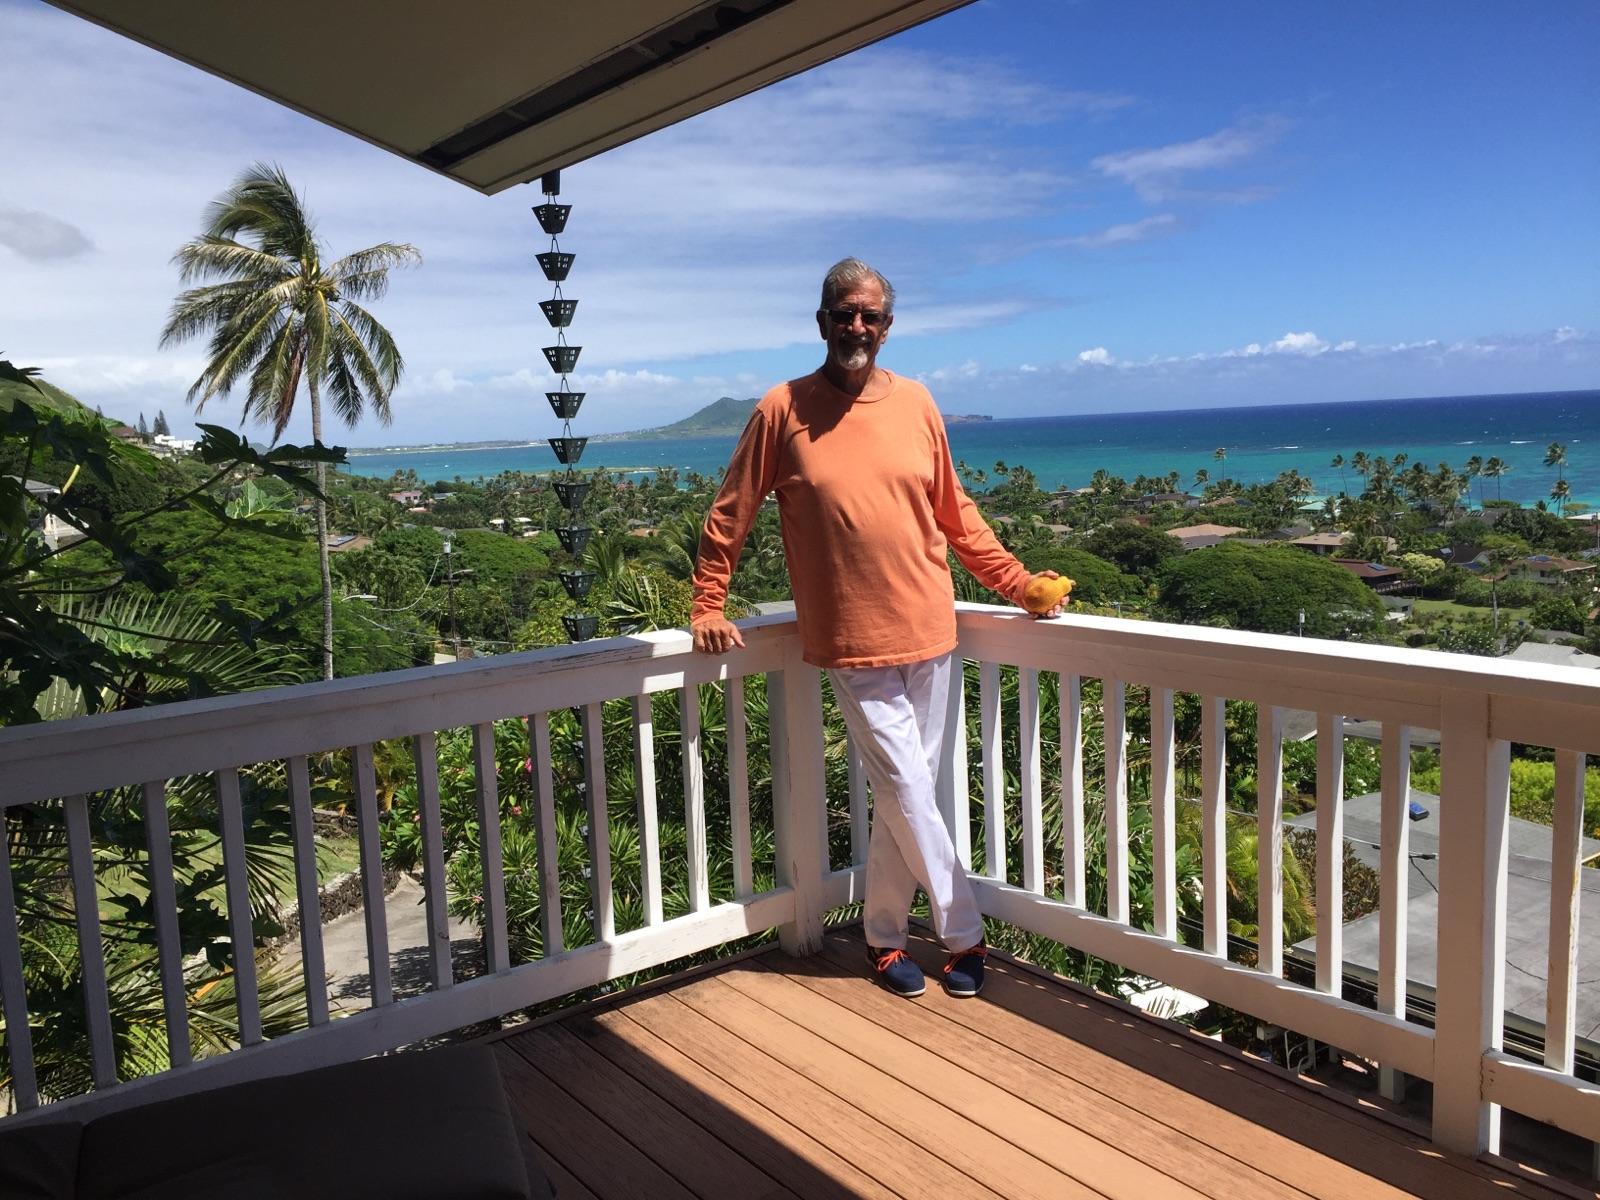 My casual look overlooking the Kailua beach.